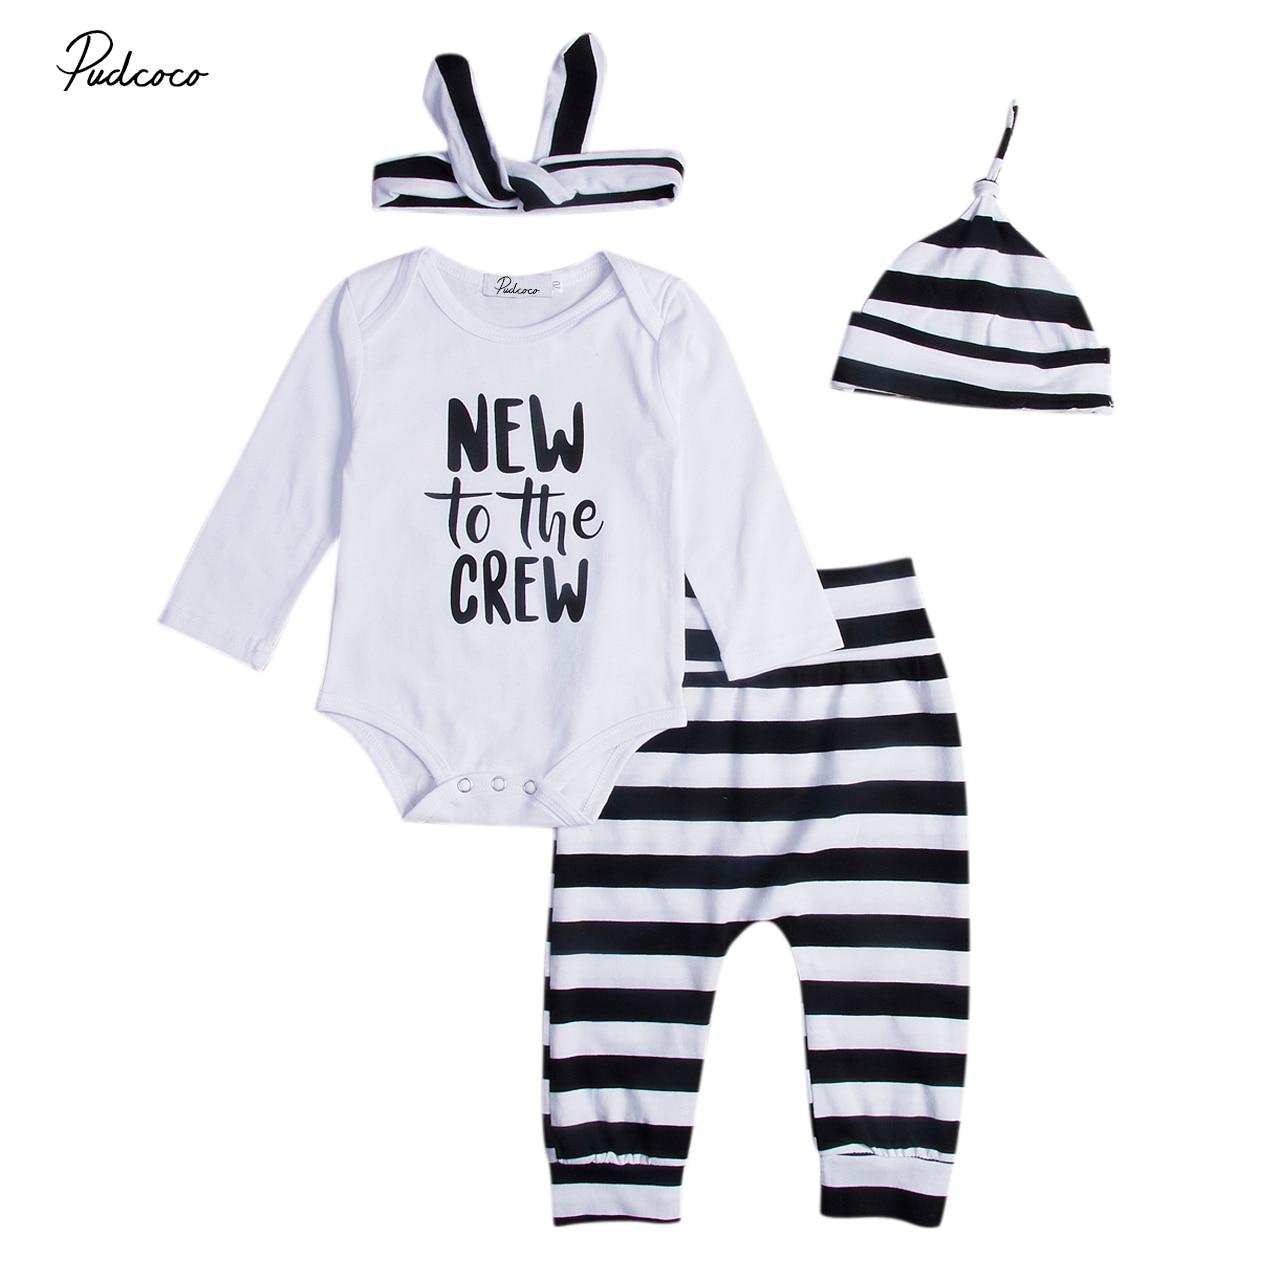 4PCS Toddler Infant Baby Boy Girls Letter Bodysuit+Striped Pants Leggings+Headband+Hat Fashion Clothes Set HOT SALE